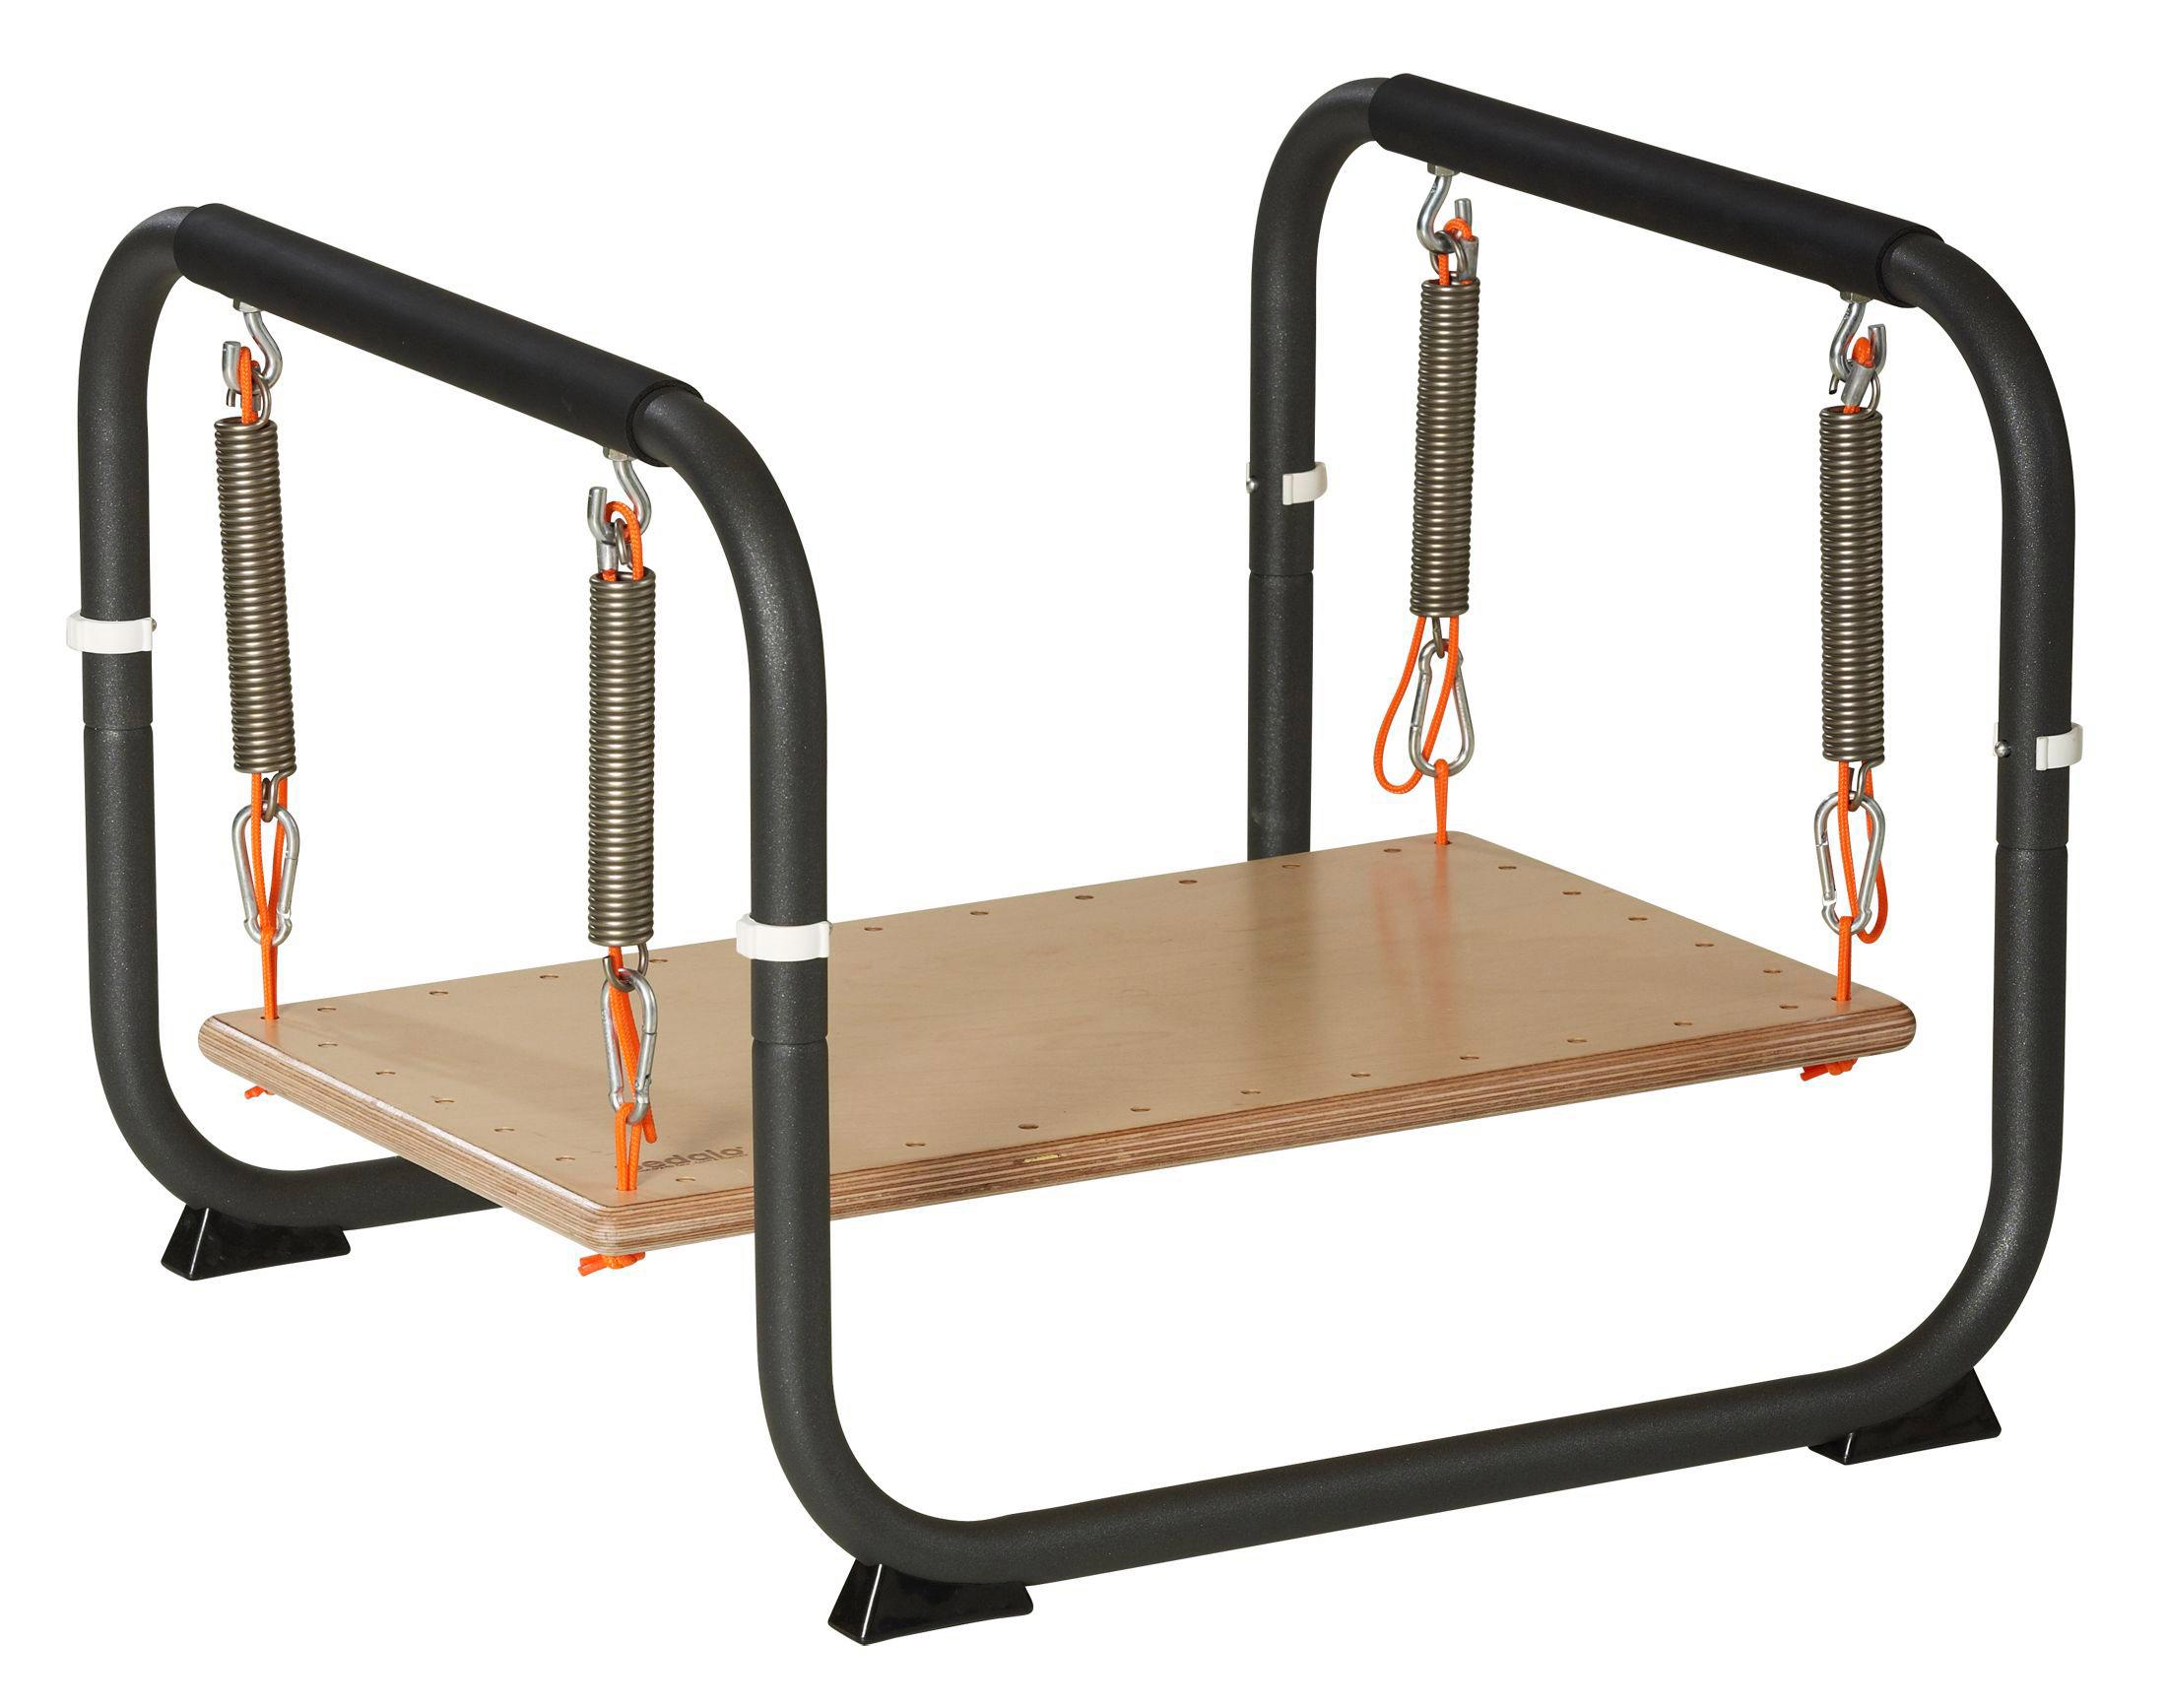 pedalo Stabilisations-Therapiegerät Pedalo Stabilisator Sport bunt Fitness Ausrüstung Sportarten